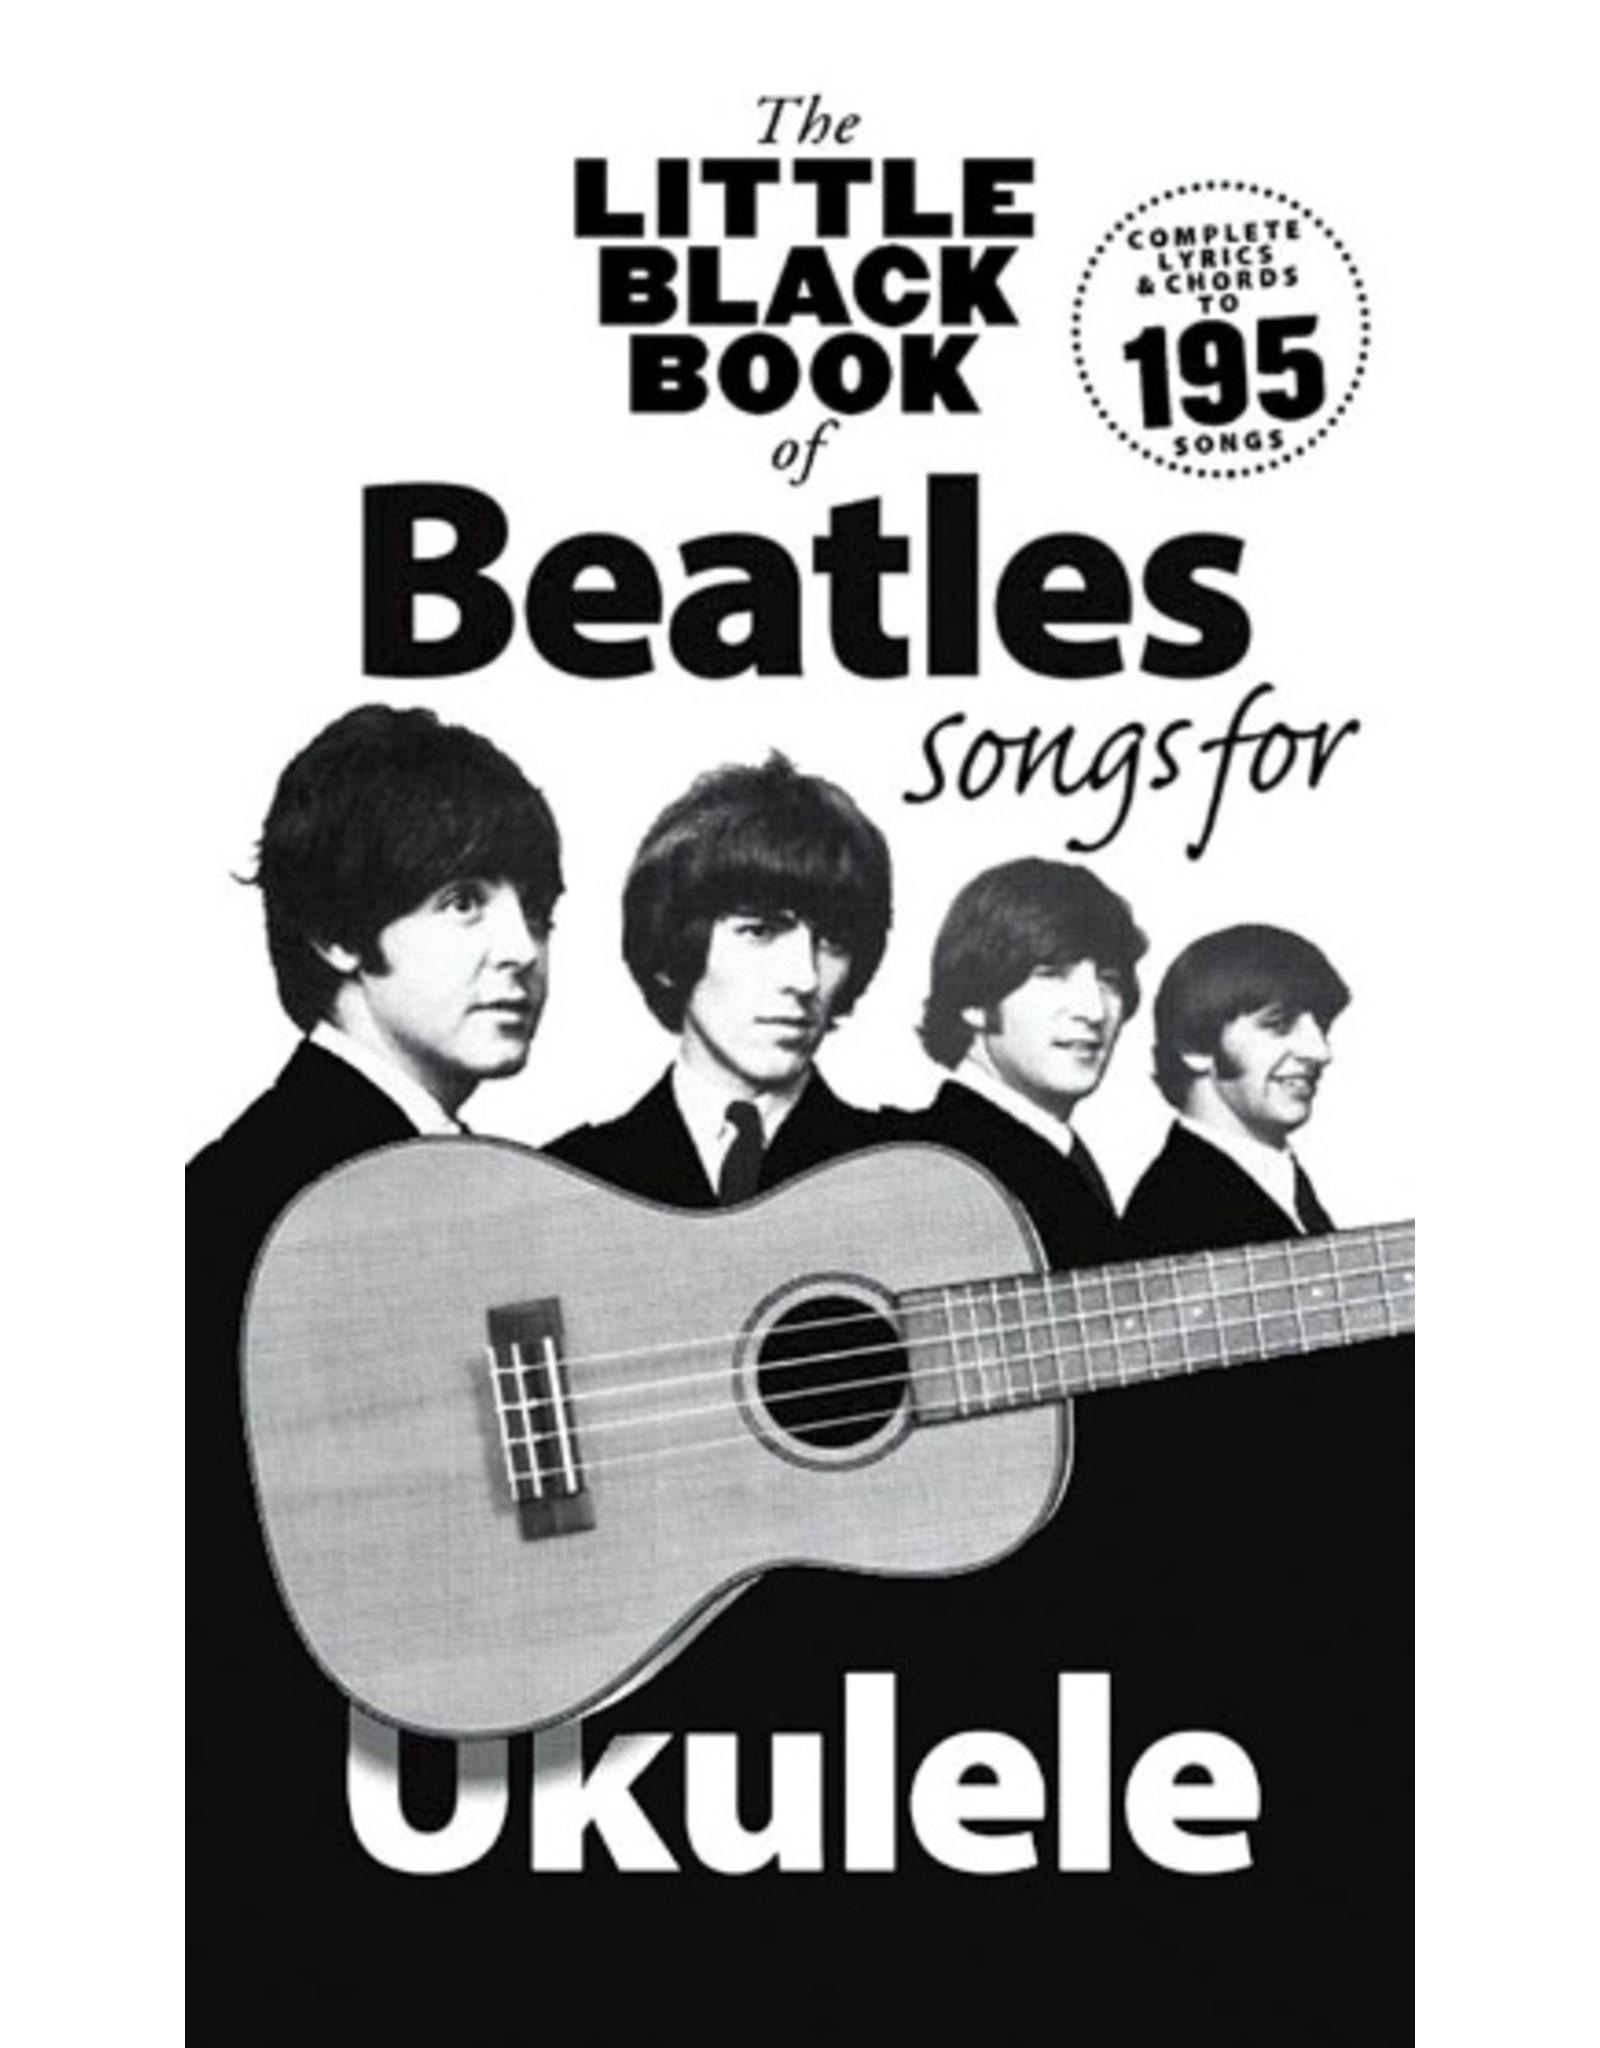 Little black songbook Beatles songs for ukulele